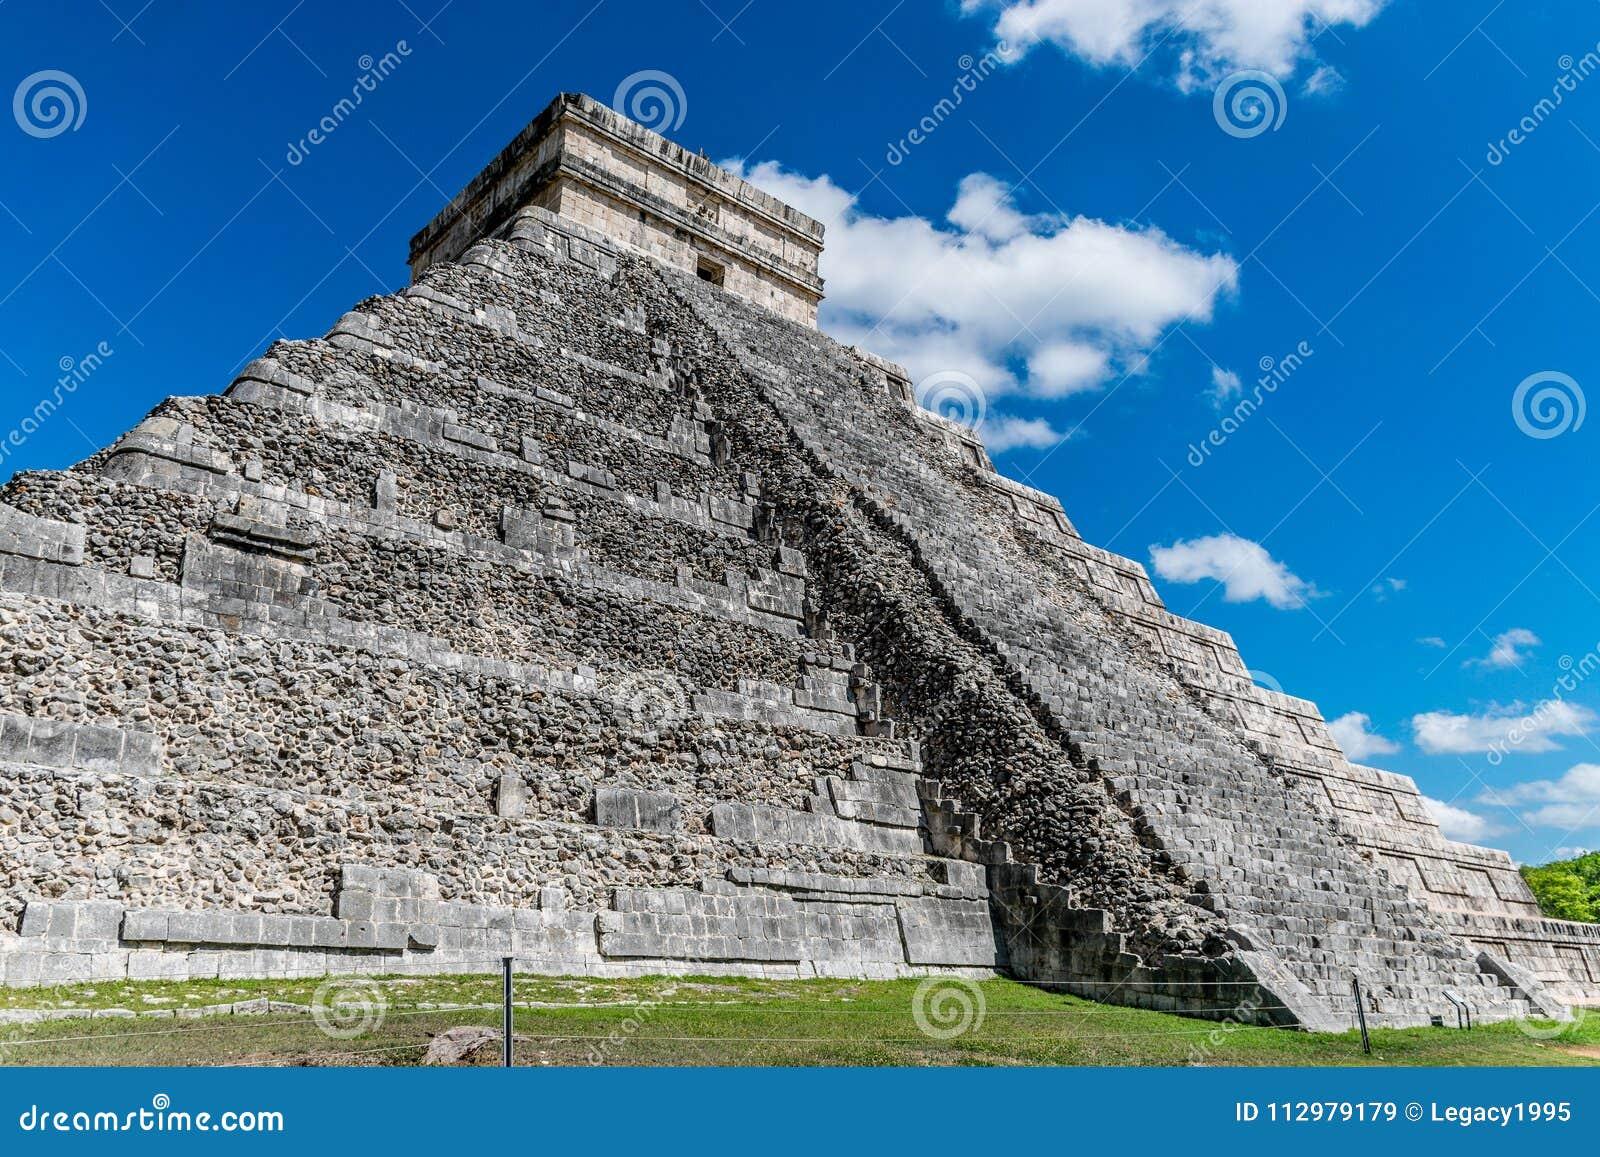 El Castillo in Chichen Itza, Mexico